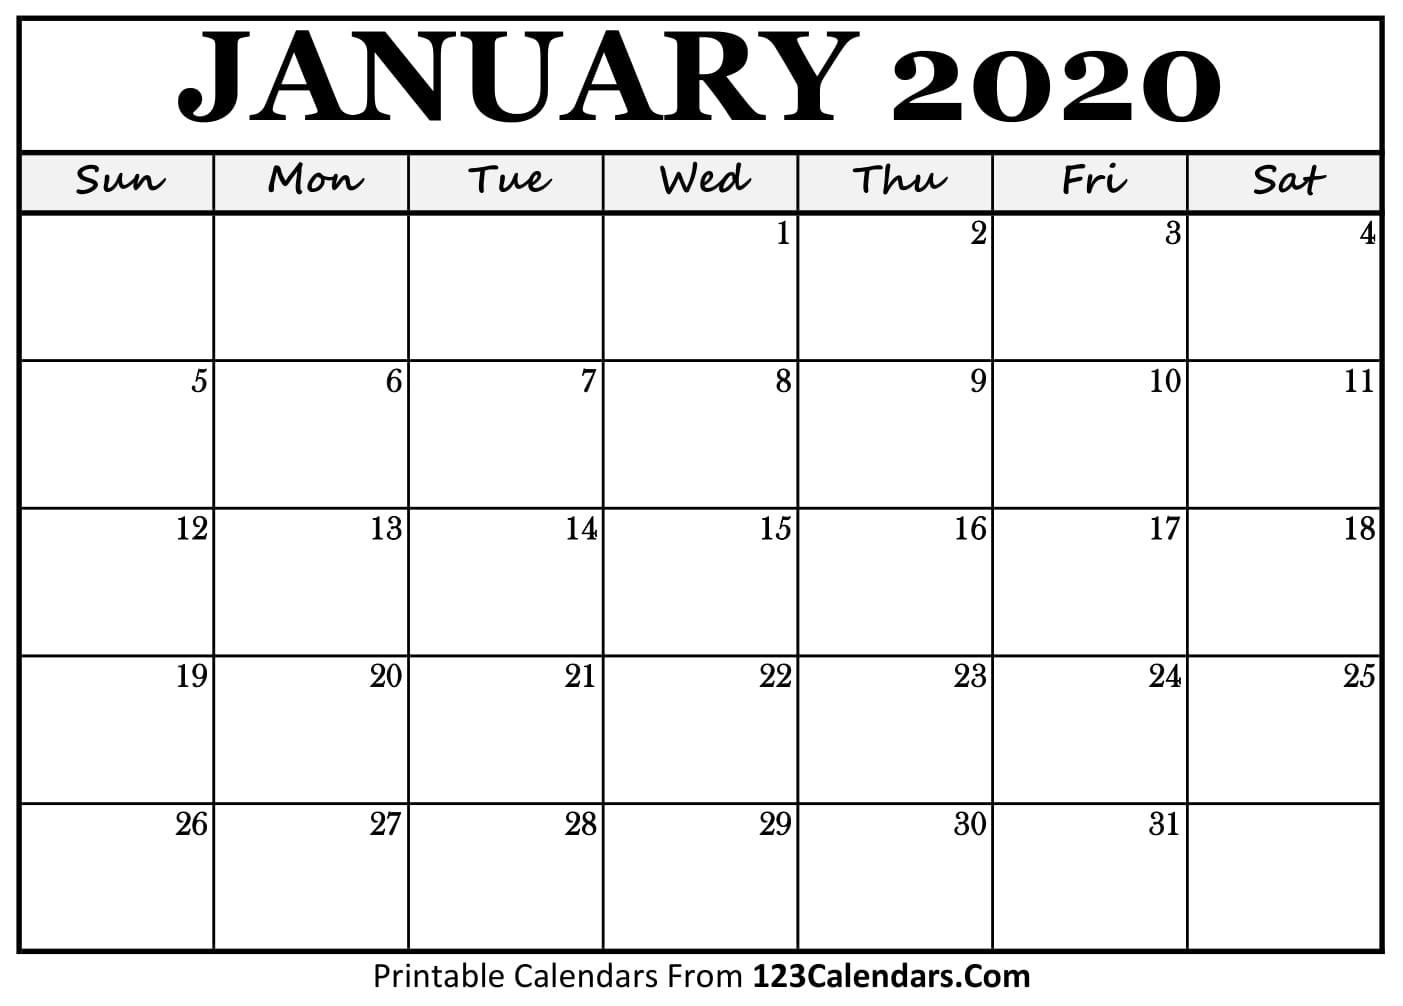 Free Printable Calendar | 123Calendars  Free Online Calendars 2020 Printable